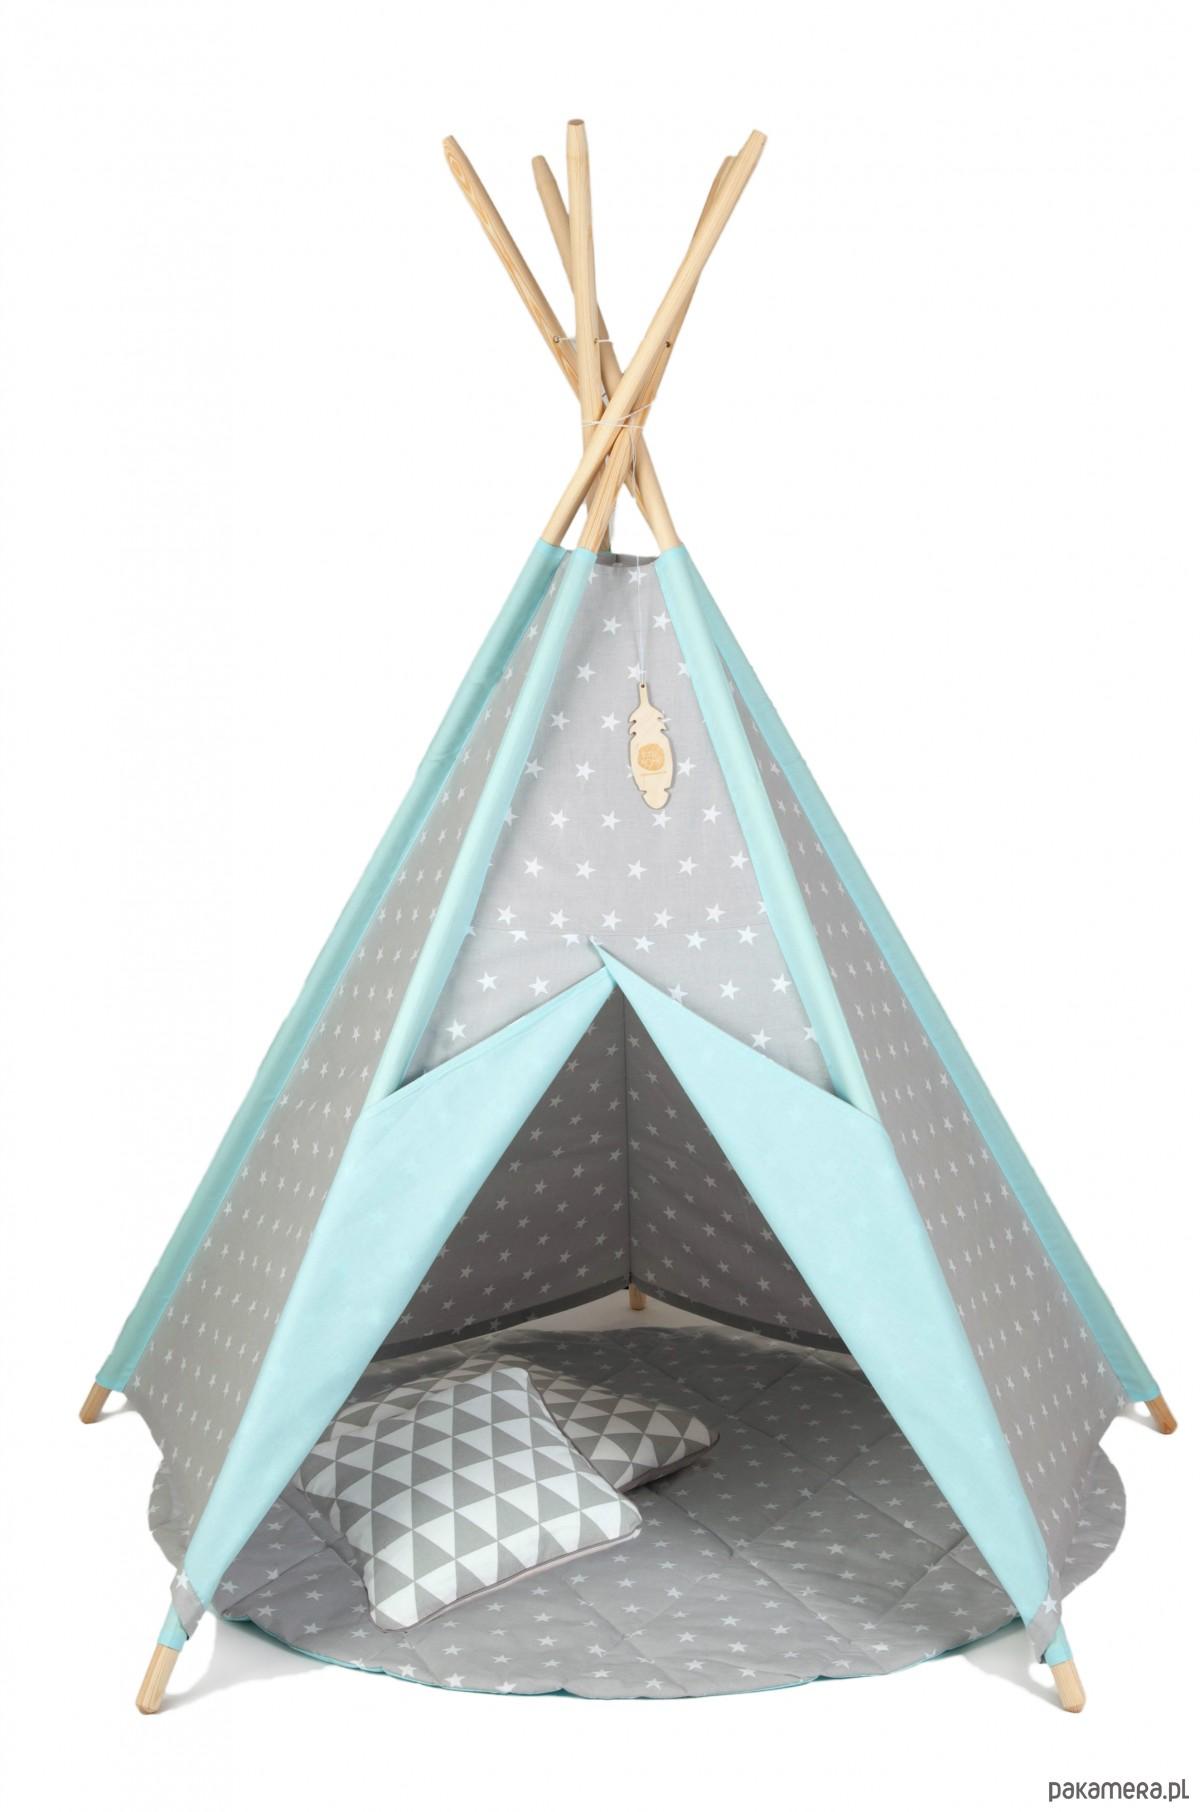 tipi littlenomad namiot wigwam pok j dziecka namioty tipi. Black Bedroom Furniture Sets. Home Design Ideas